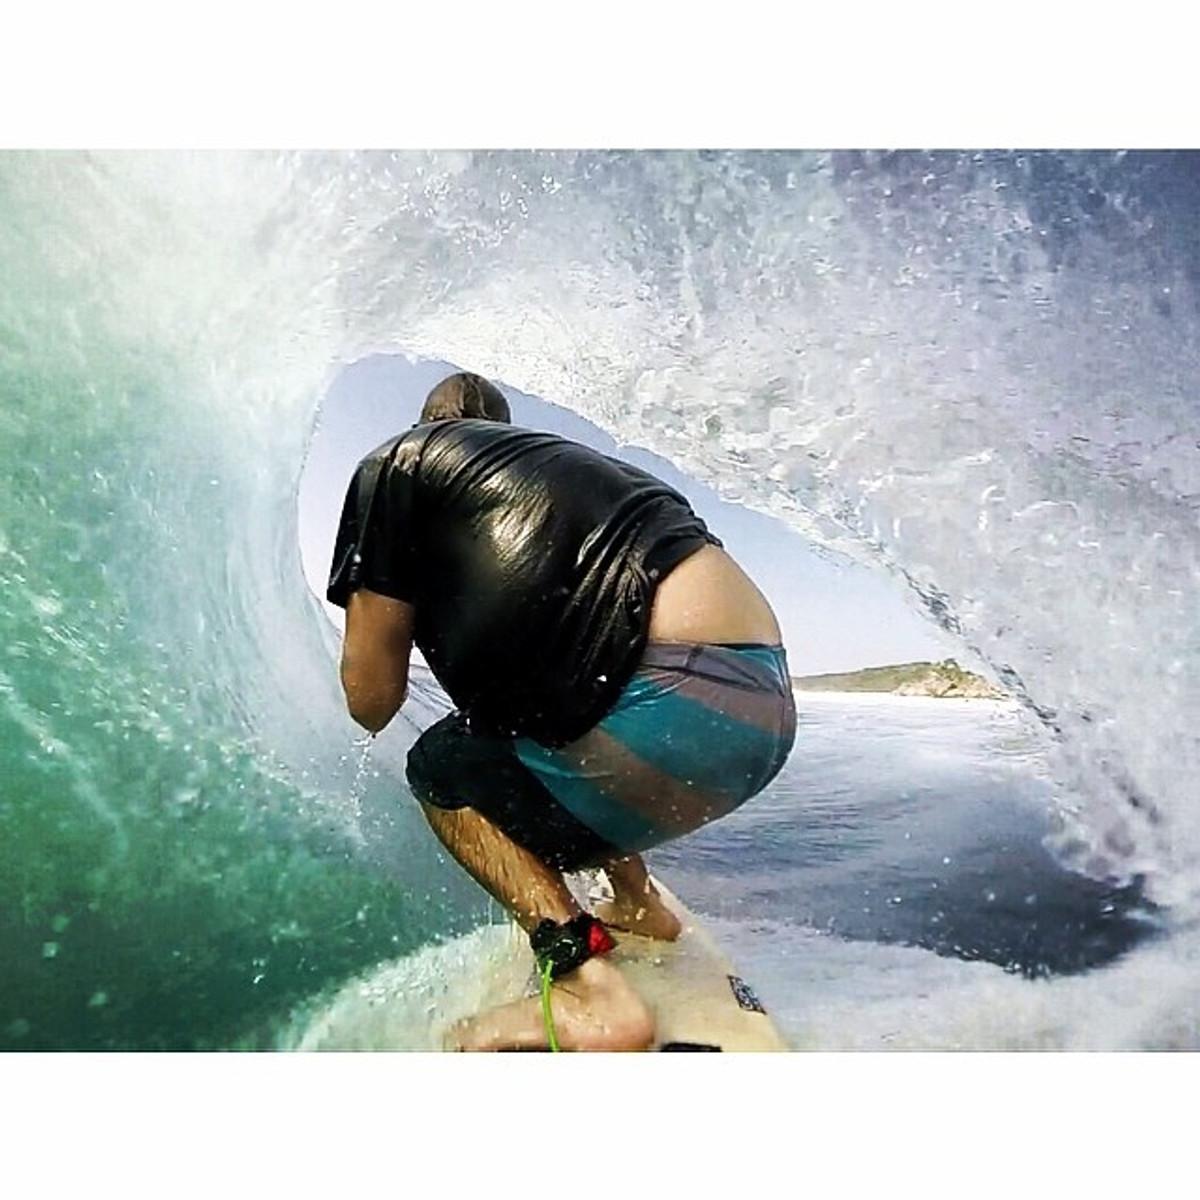 LUNASURF Alien 6ft 6mm Travel Surfboard Leash Black